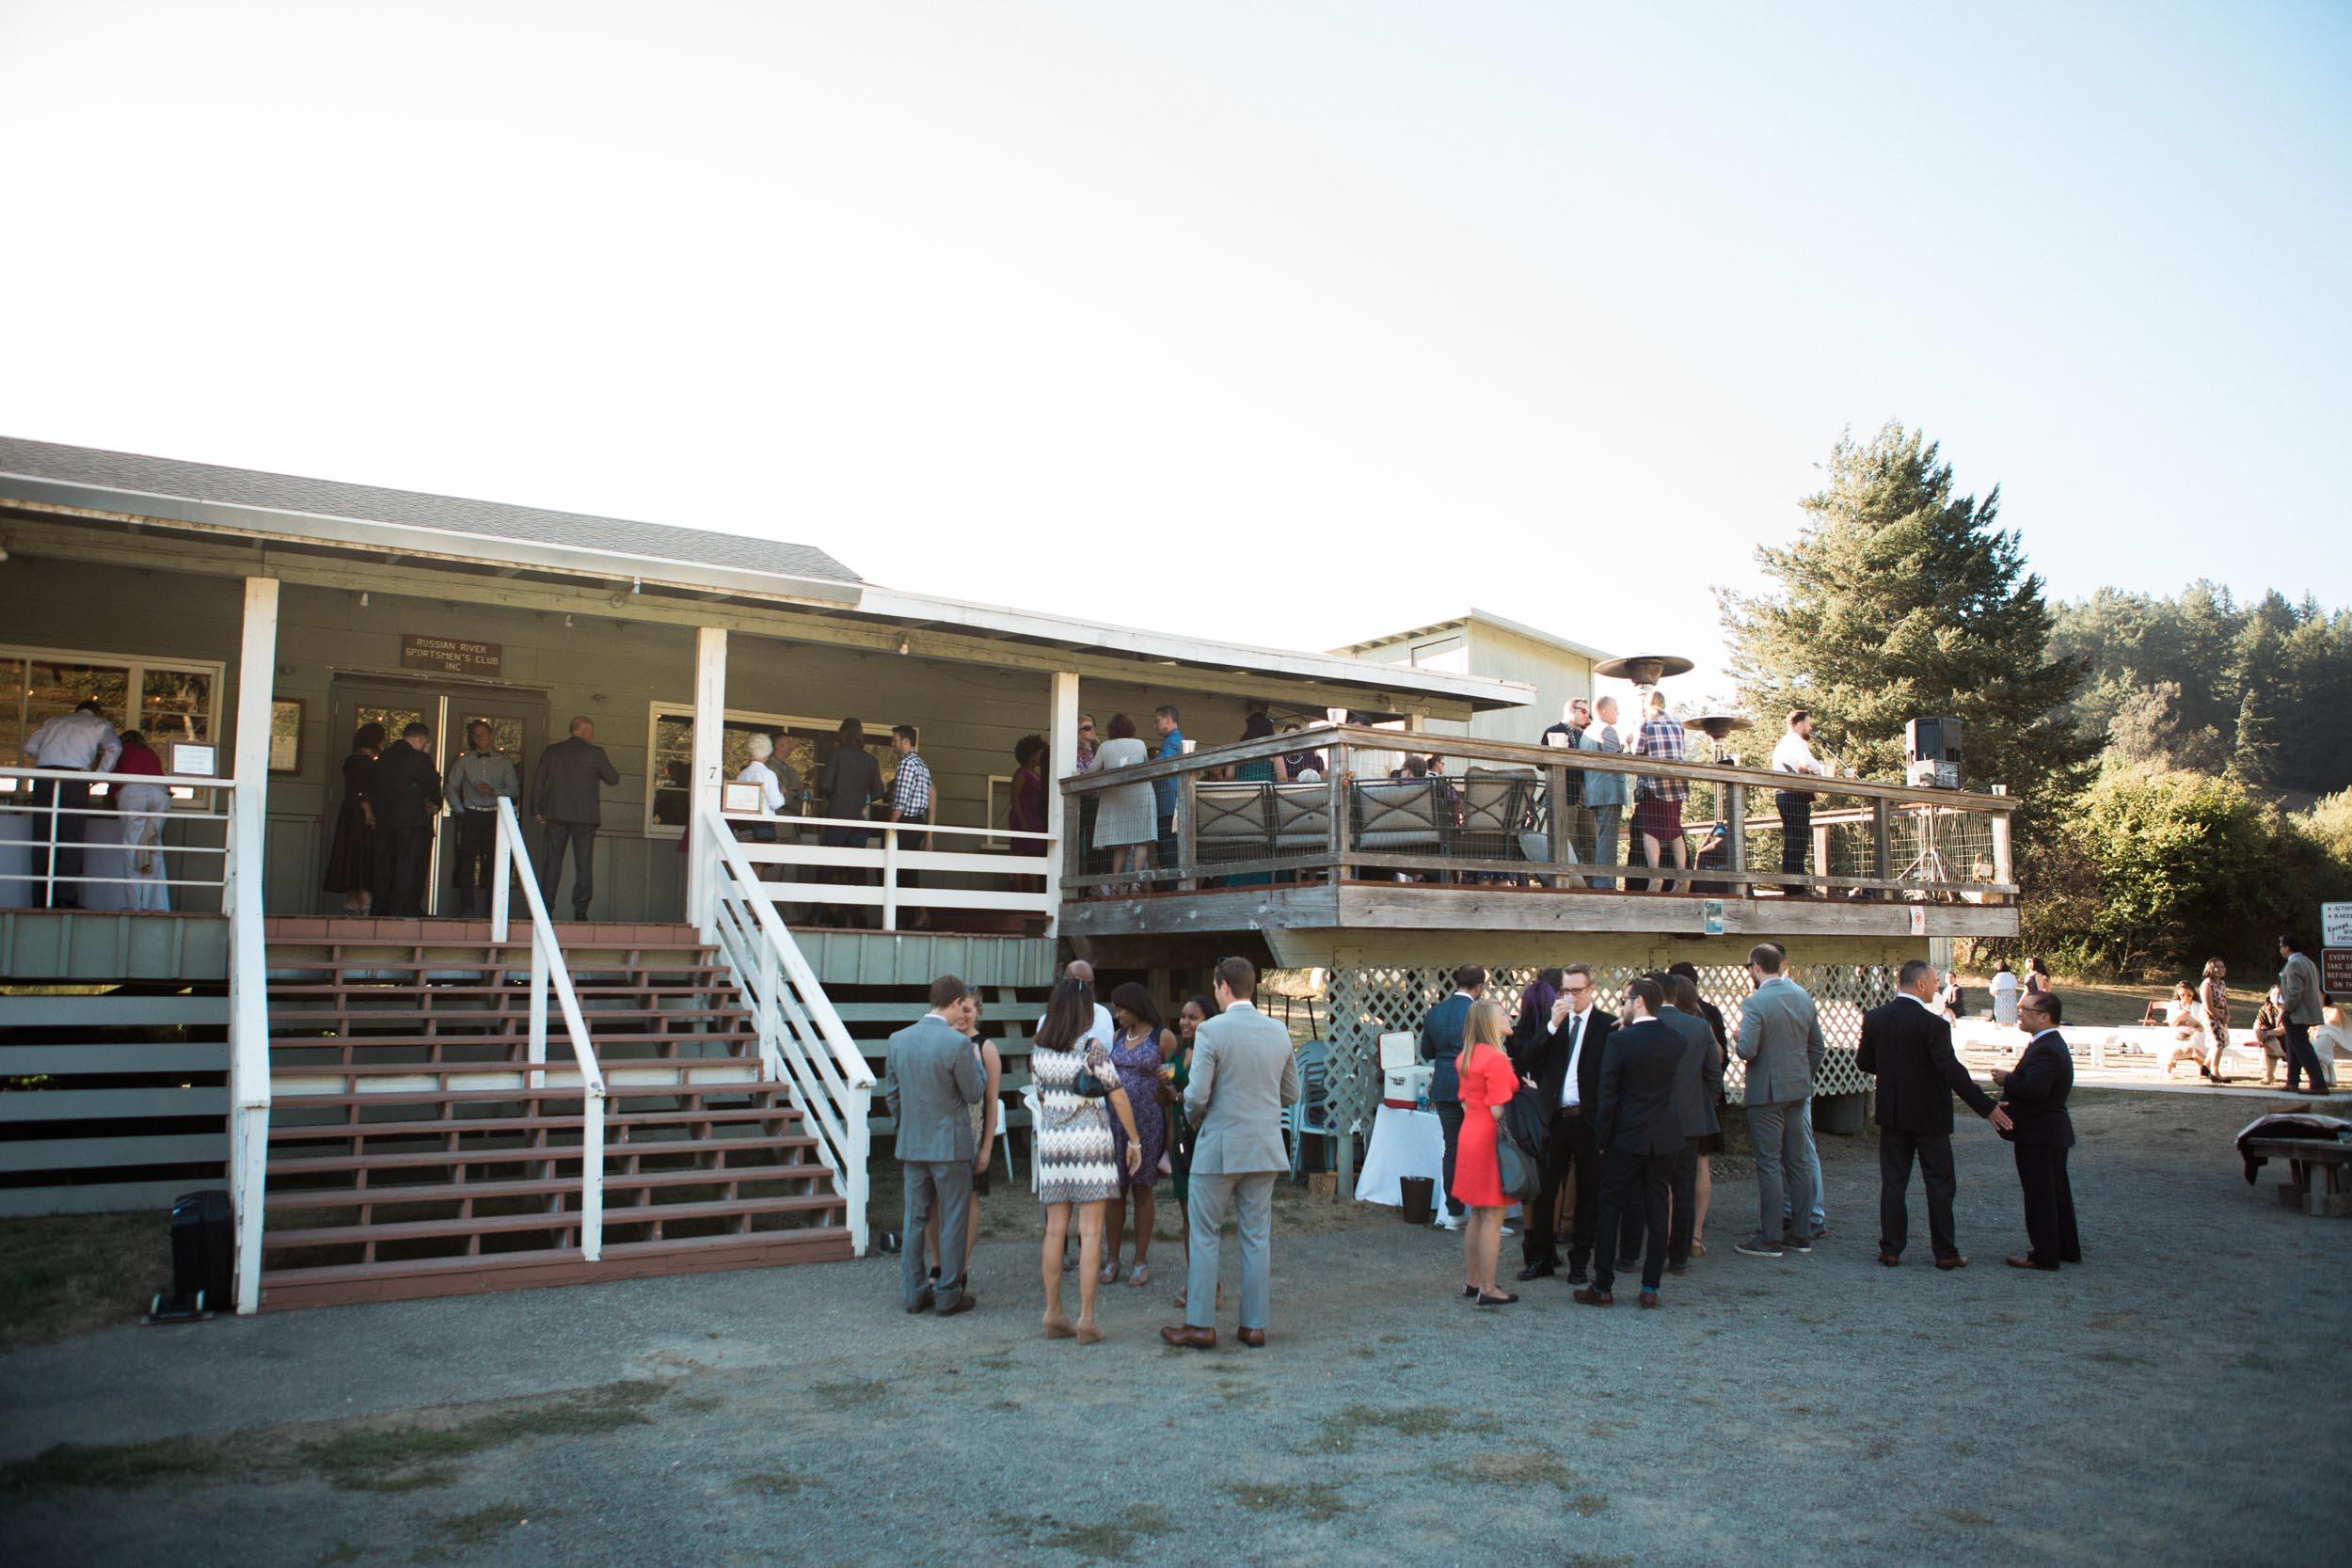 BKM-Photography-Russian-River-Wedding-Redwoods-Guerneville-California-Destination-Wedding-Photographer-0060.jpg